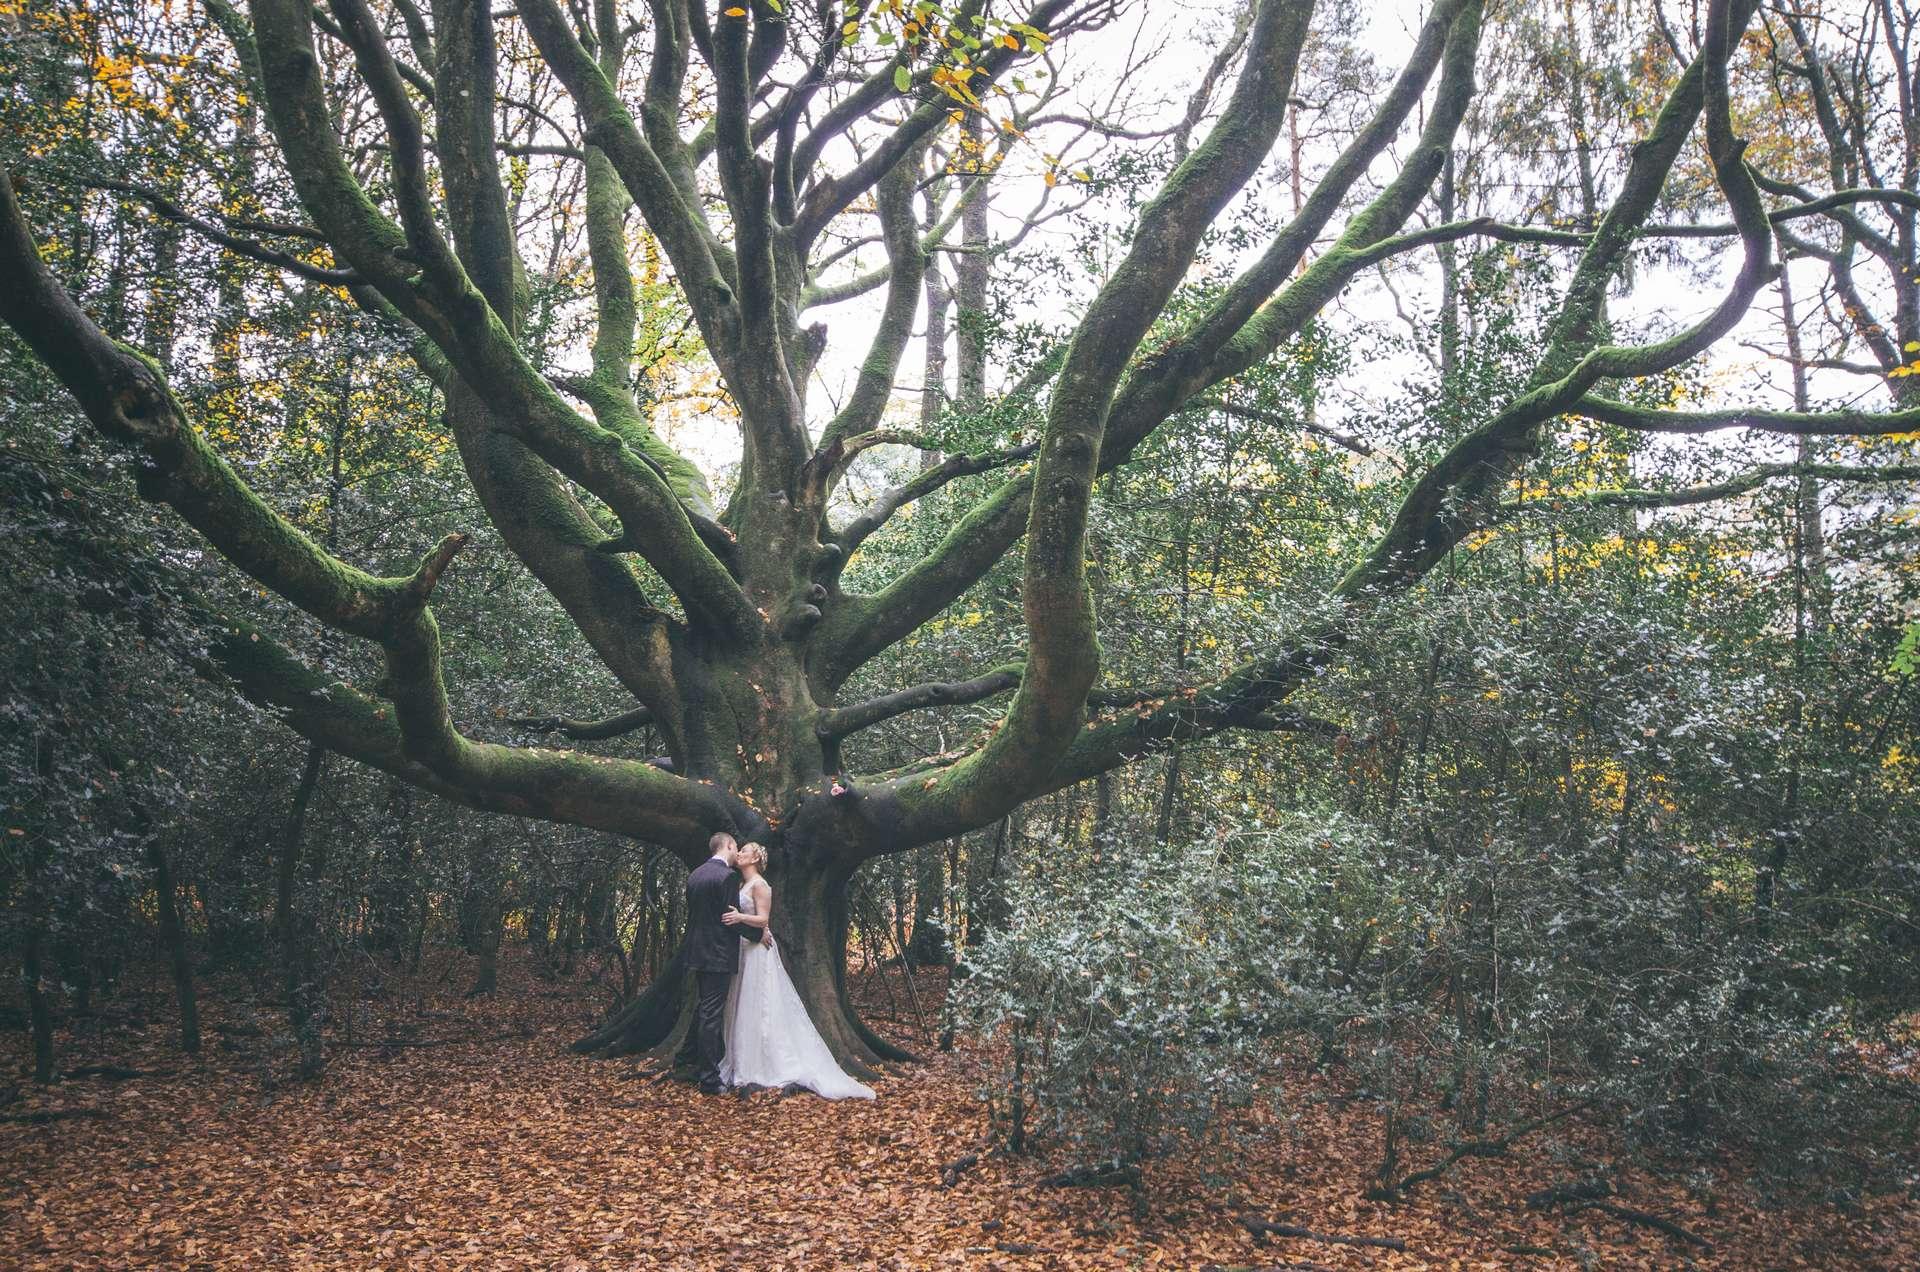 tarifs prestations photographe mariage bretagne saint brieuc ctes darmor - Photographe Mariage Saint Brieuc